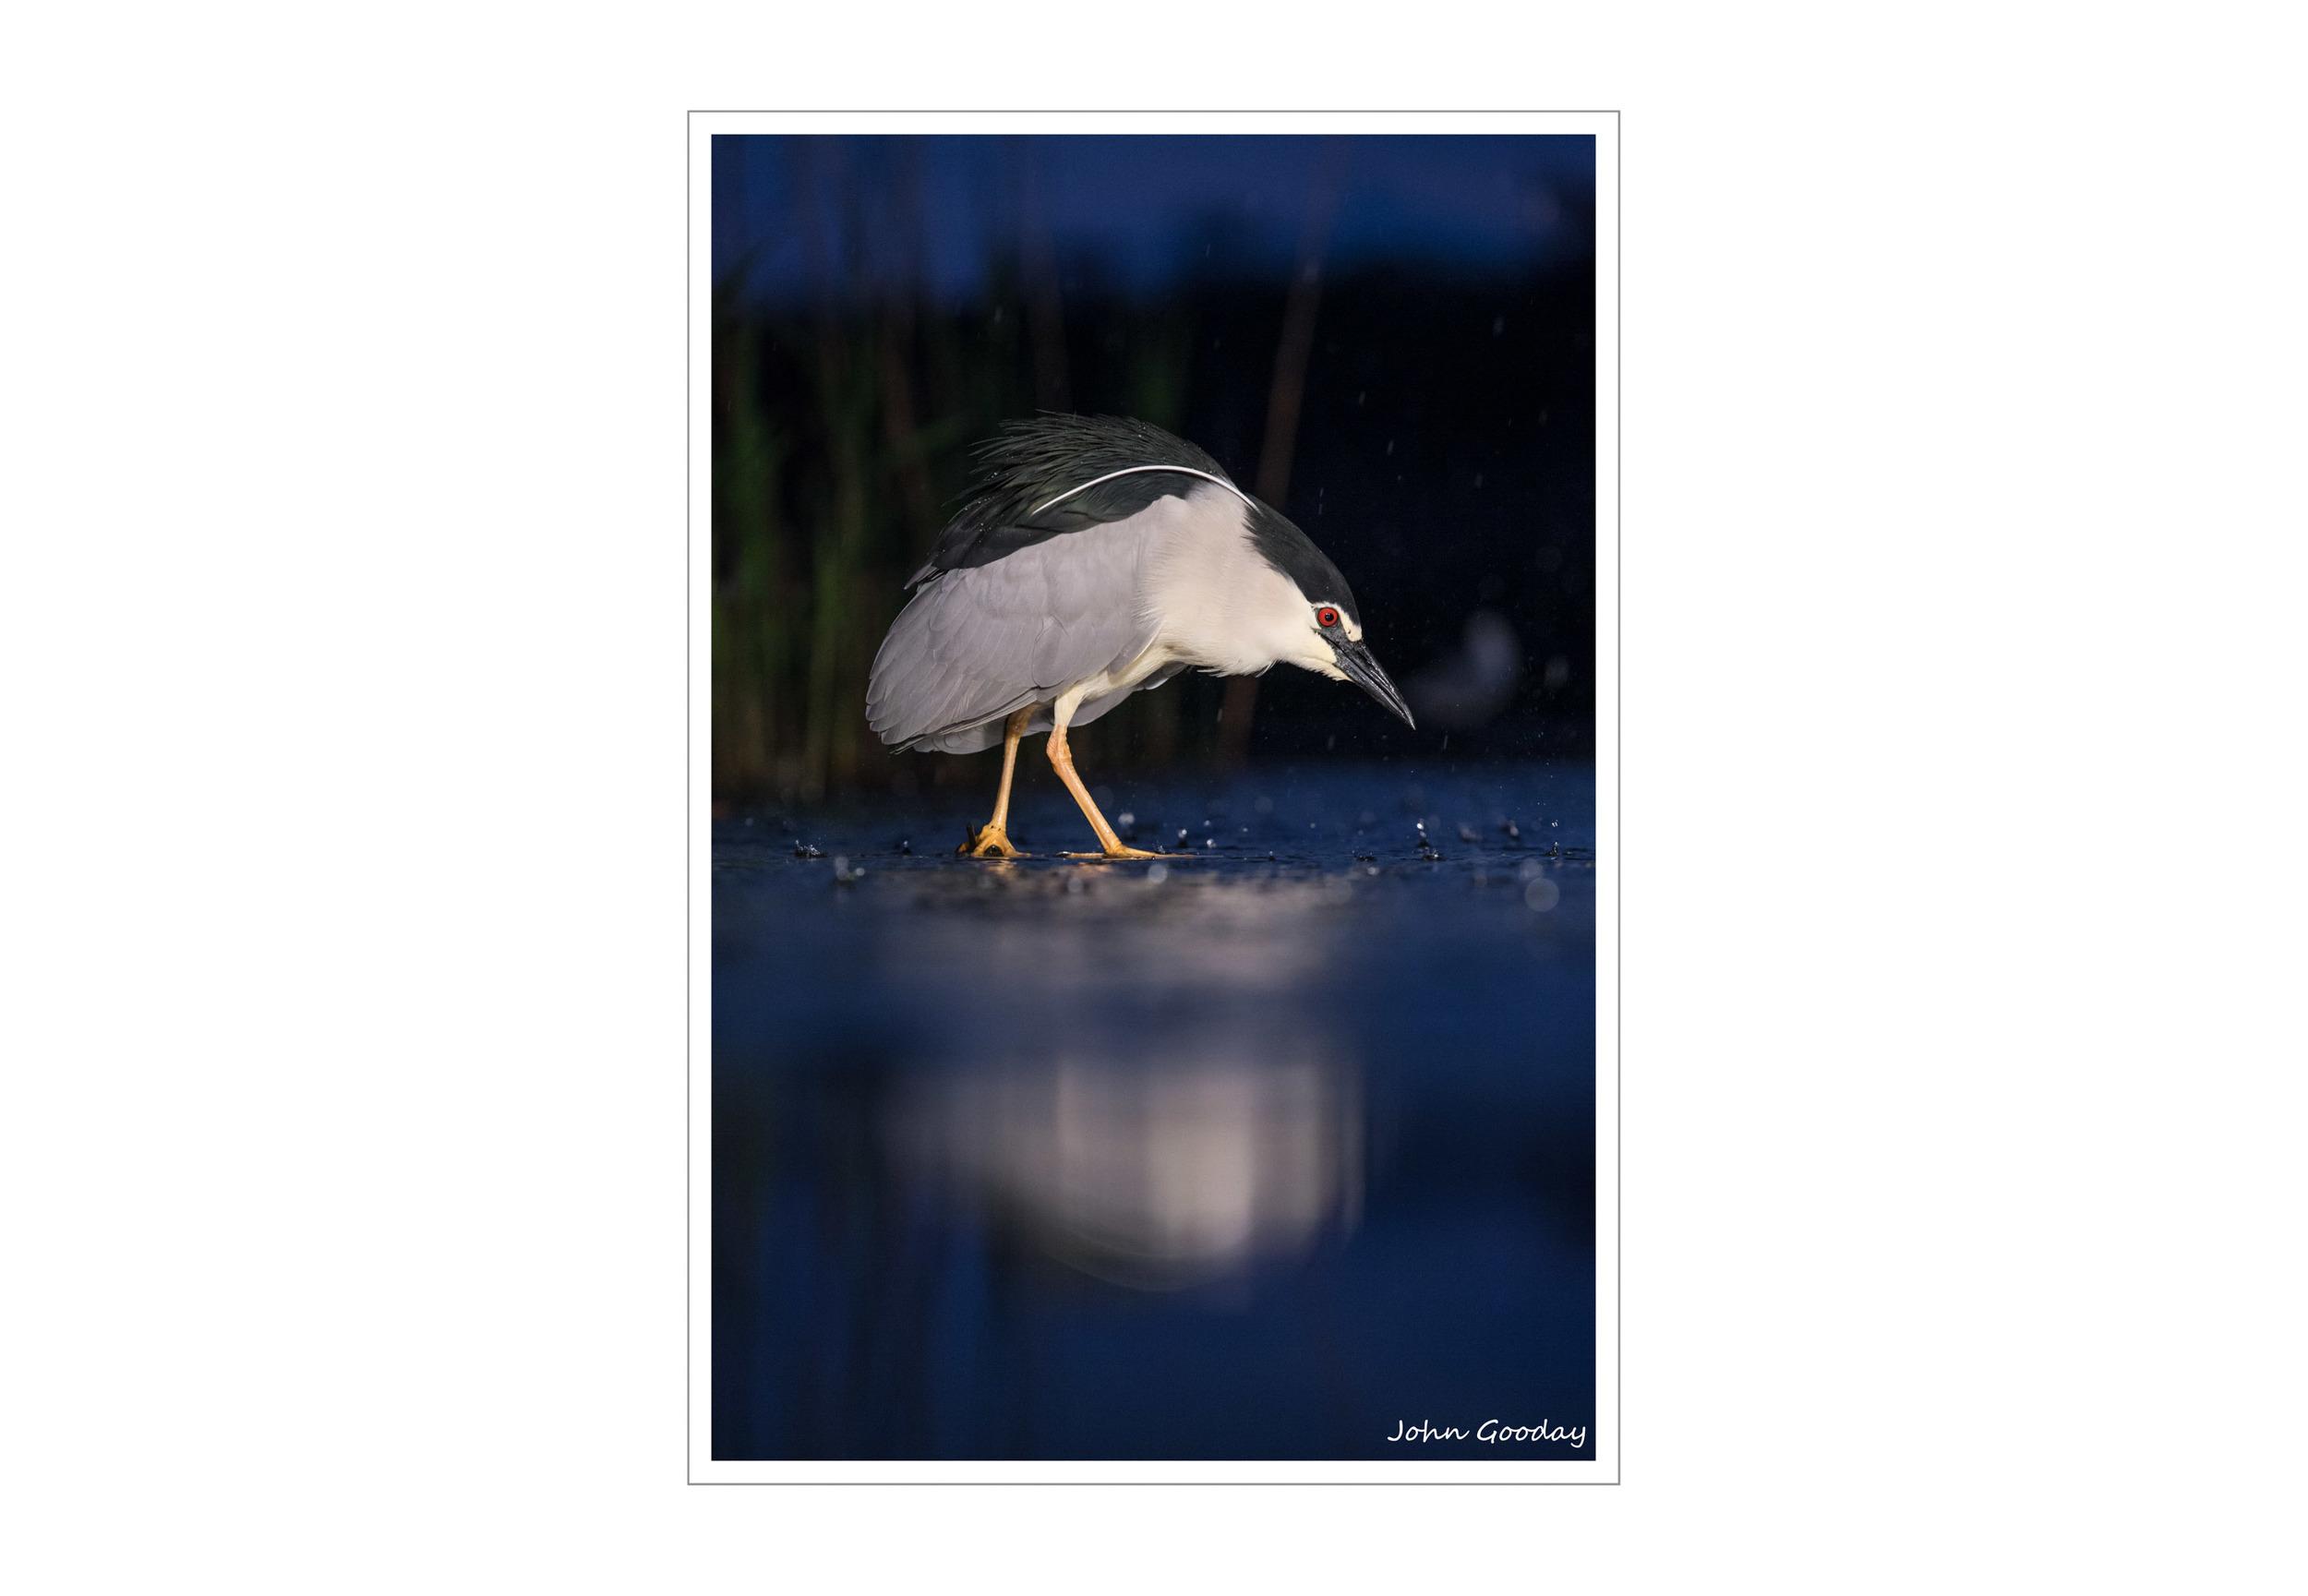 Black-crowned Night Heron in pre-dawn light.   Canon EOS 1DX, EF70-200mm f/2.8L IS II, 1/800 sec @ f/4, ISO 2000, 2 x 1000W halogen floodlights tripod, hide